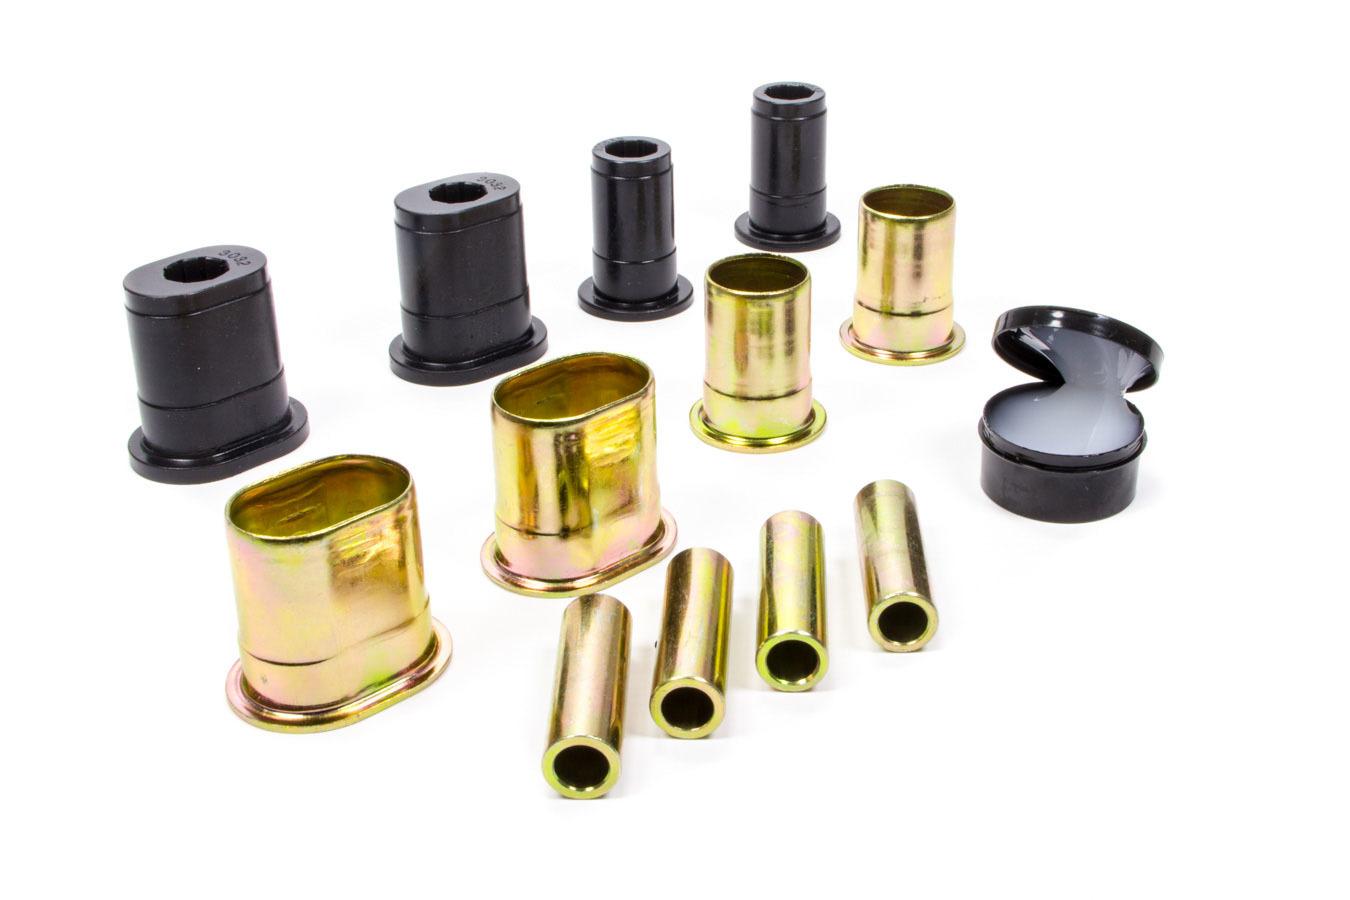 Energy Suspension 3-3168G Control Arm Bushing, Hyper-Flex, Front, Lower, Polyurethane, Black, GM A-Body 1966-73, Kit